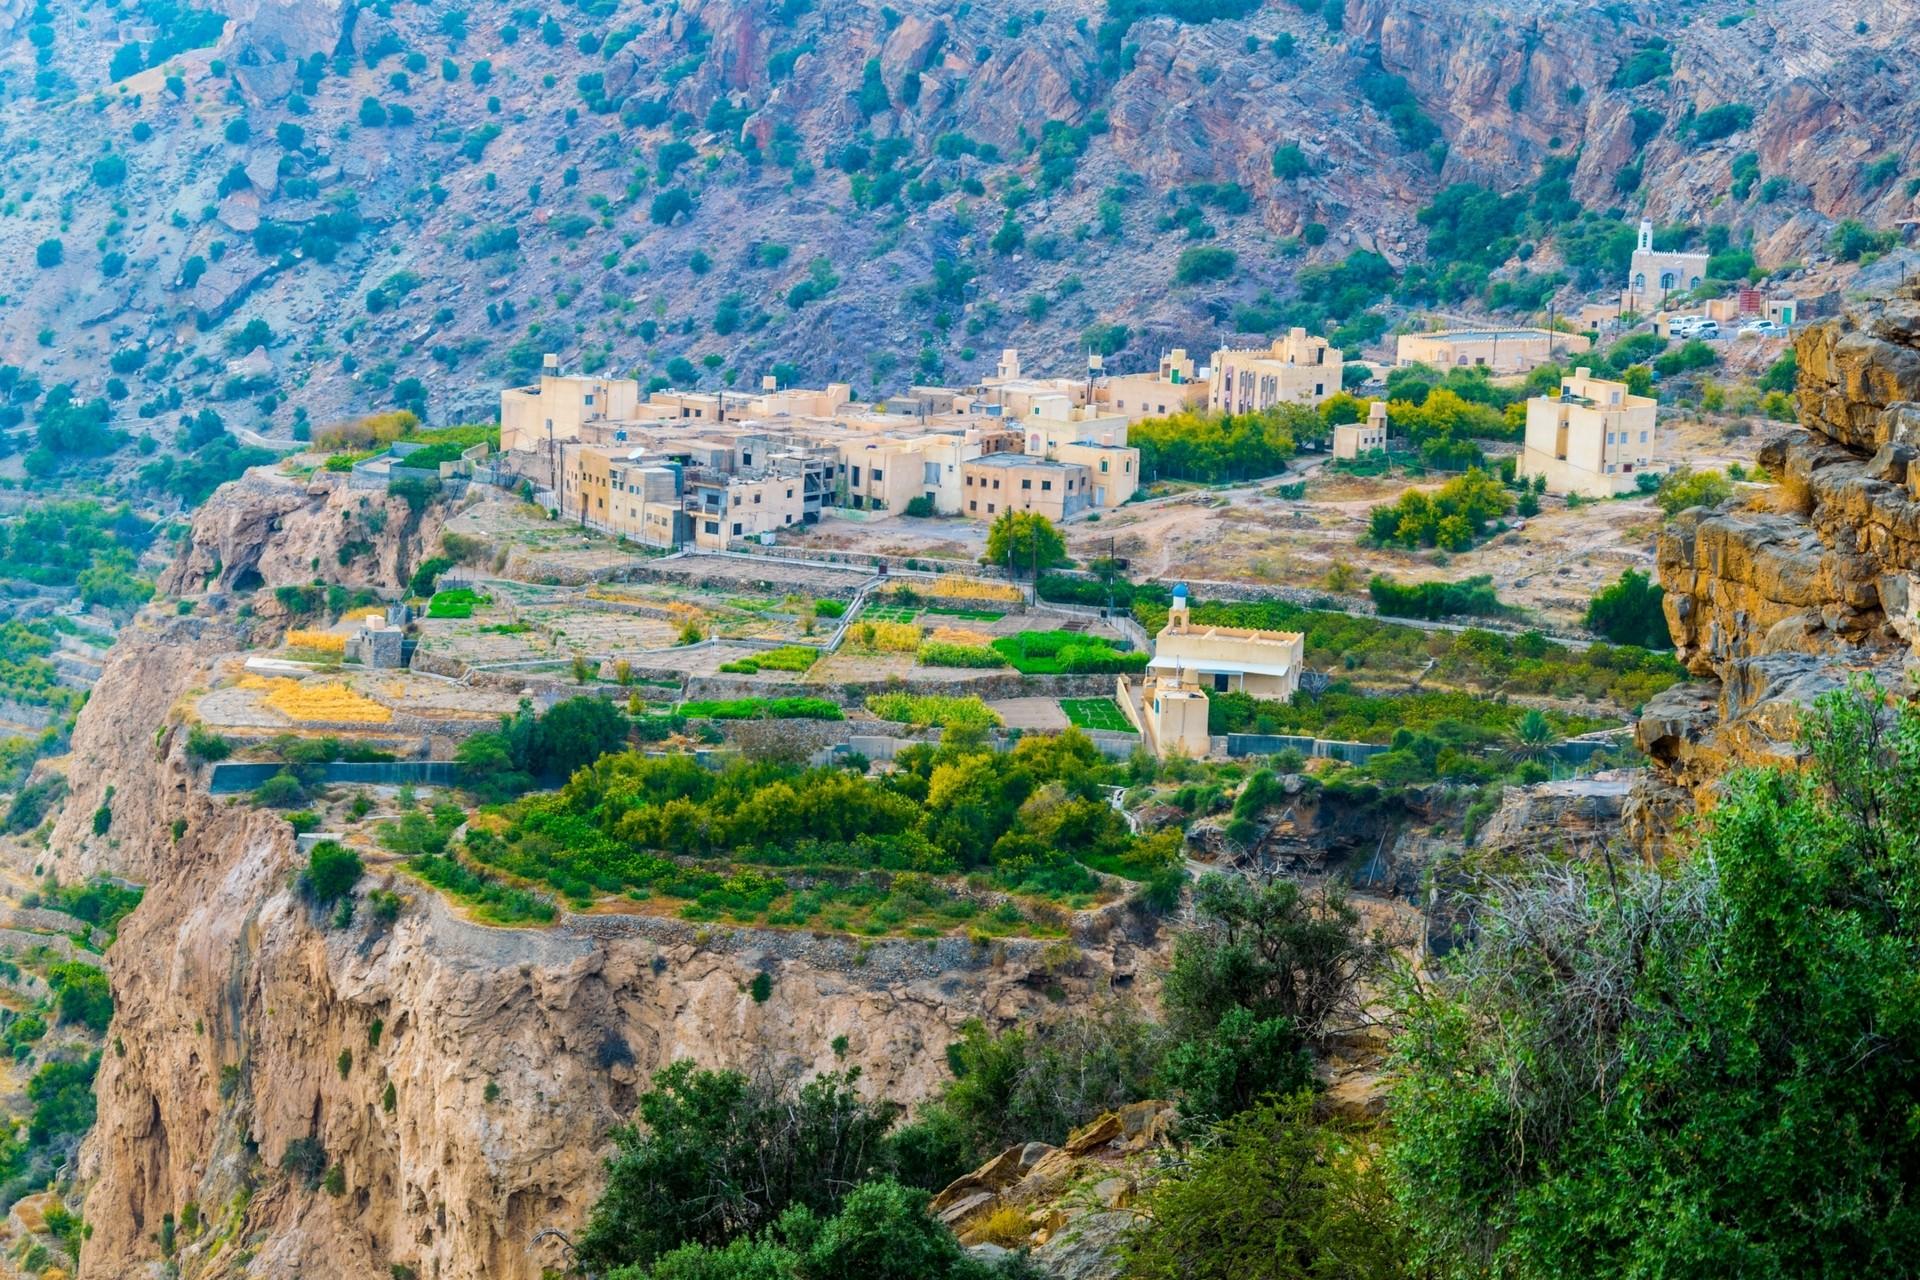 Village on Saiq Plateau on Jebel Akhdar Mountain